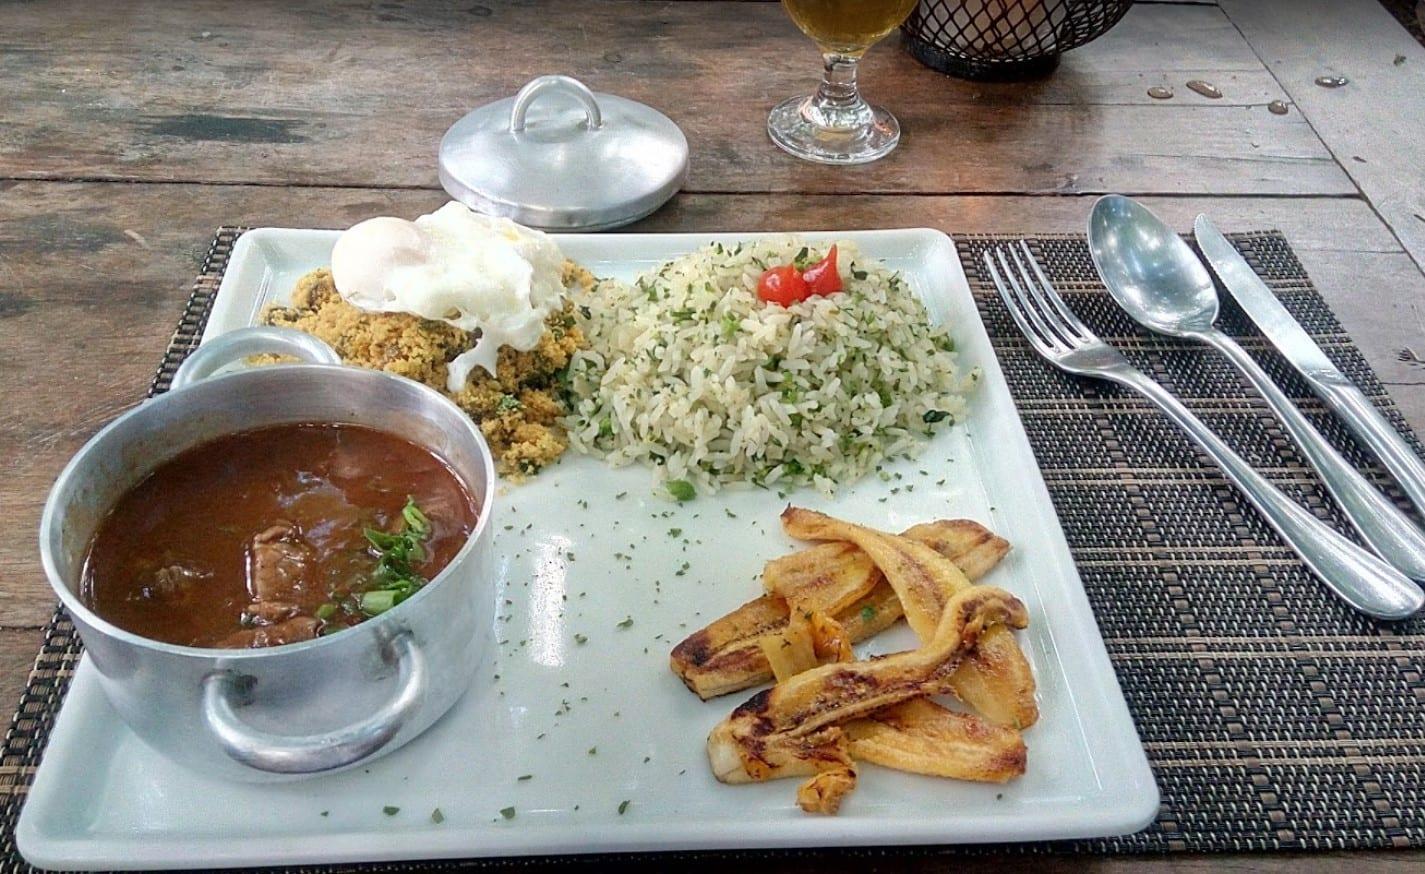 almoçar em Brasília_ almoço